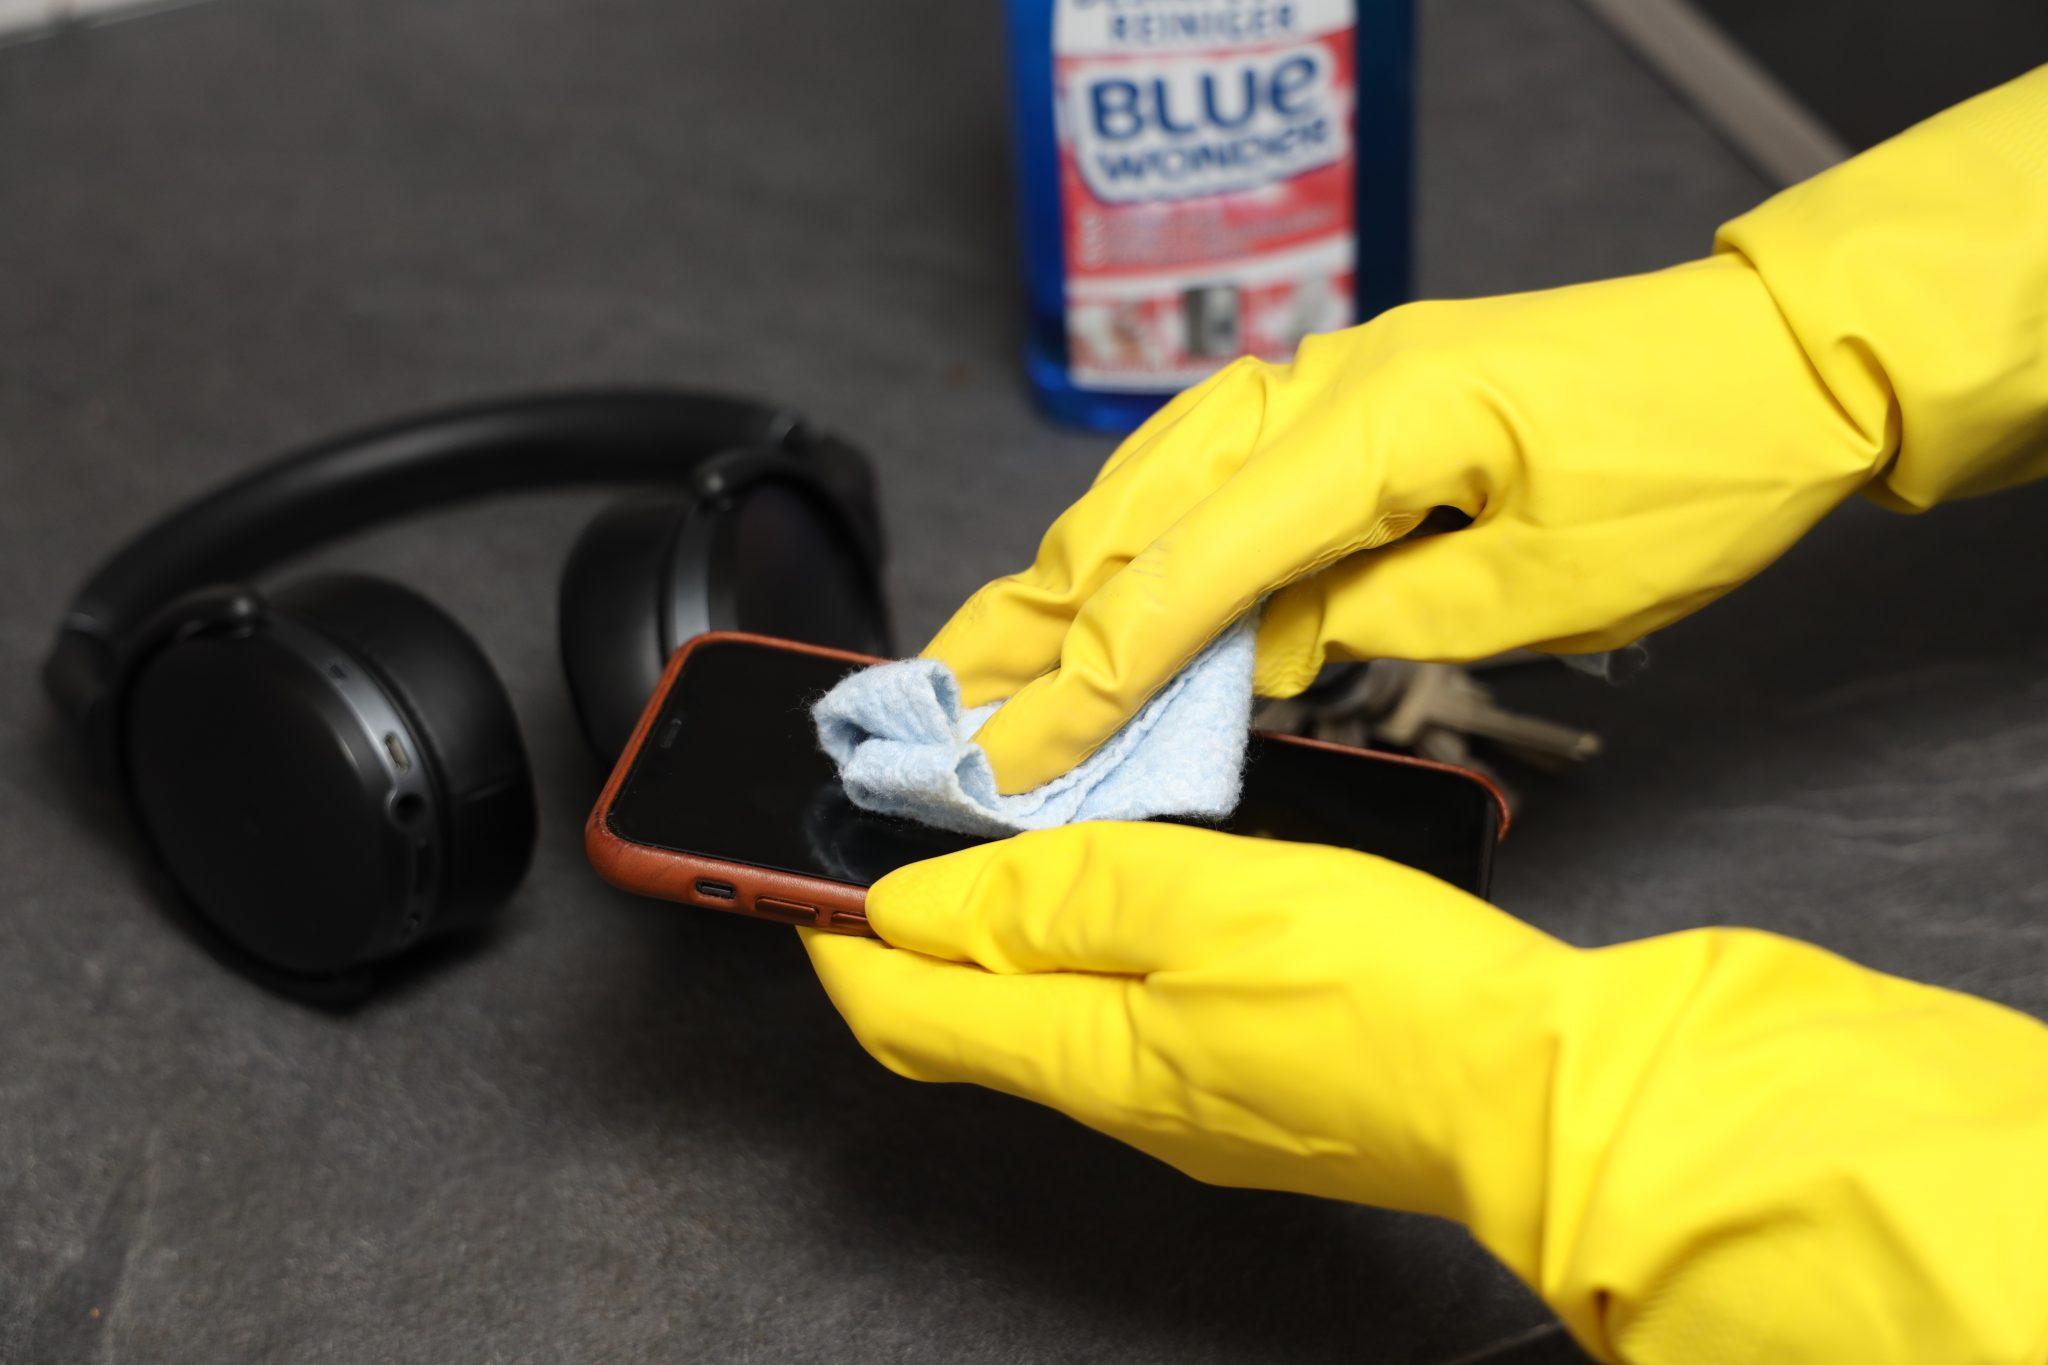 Accessoires desinfecteren